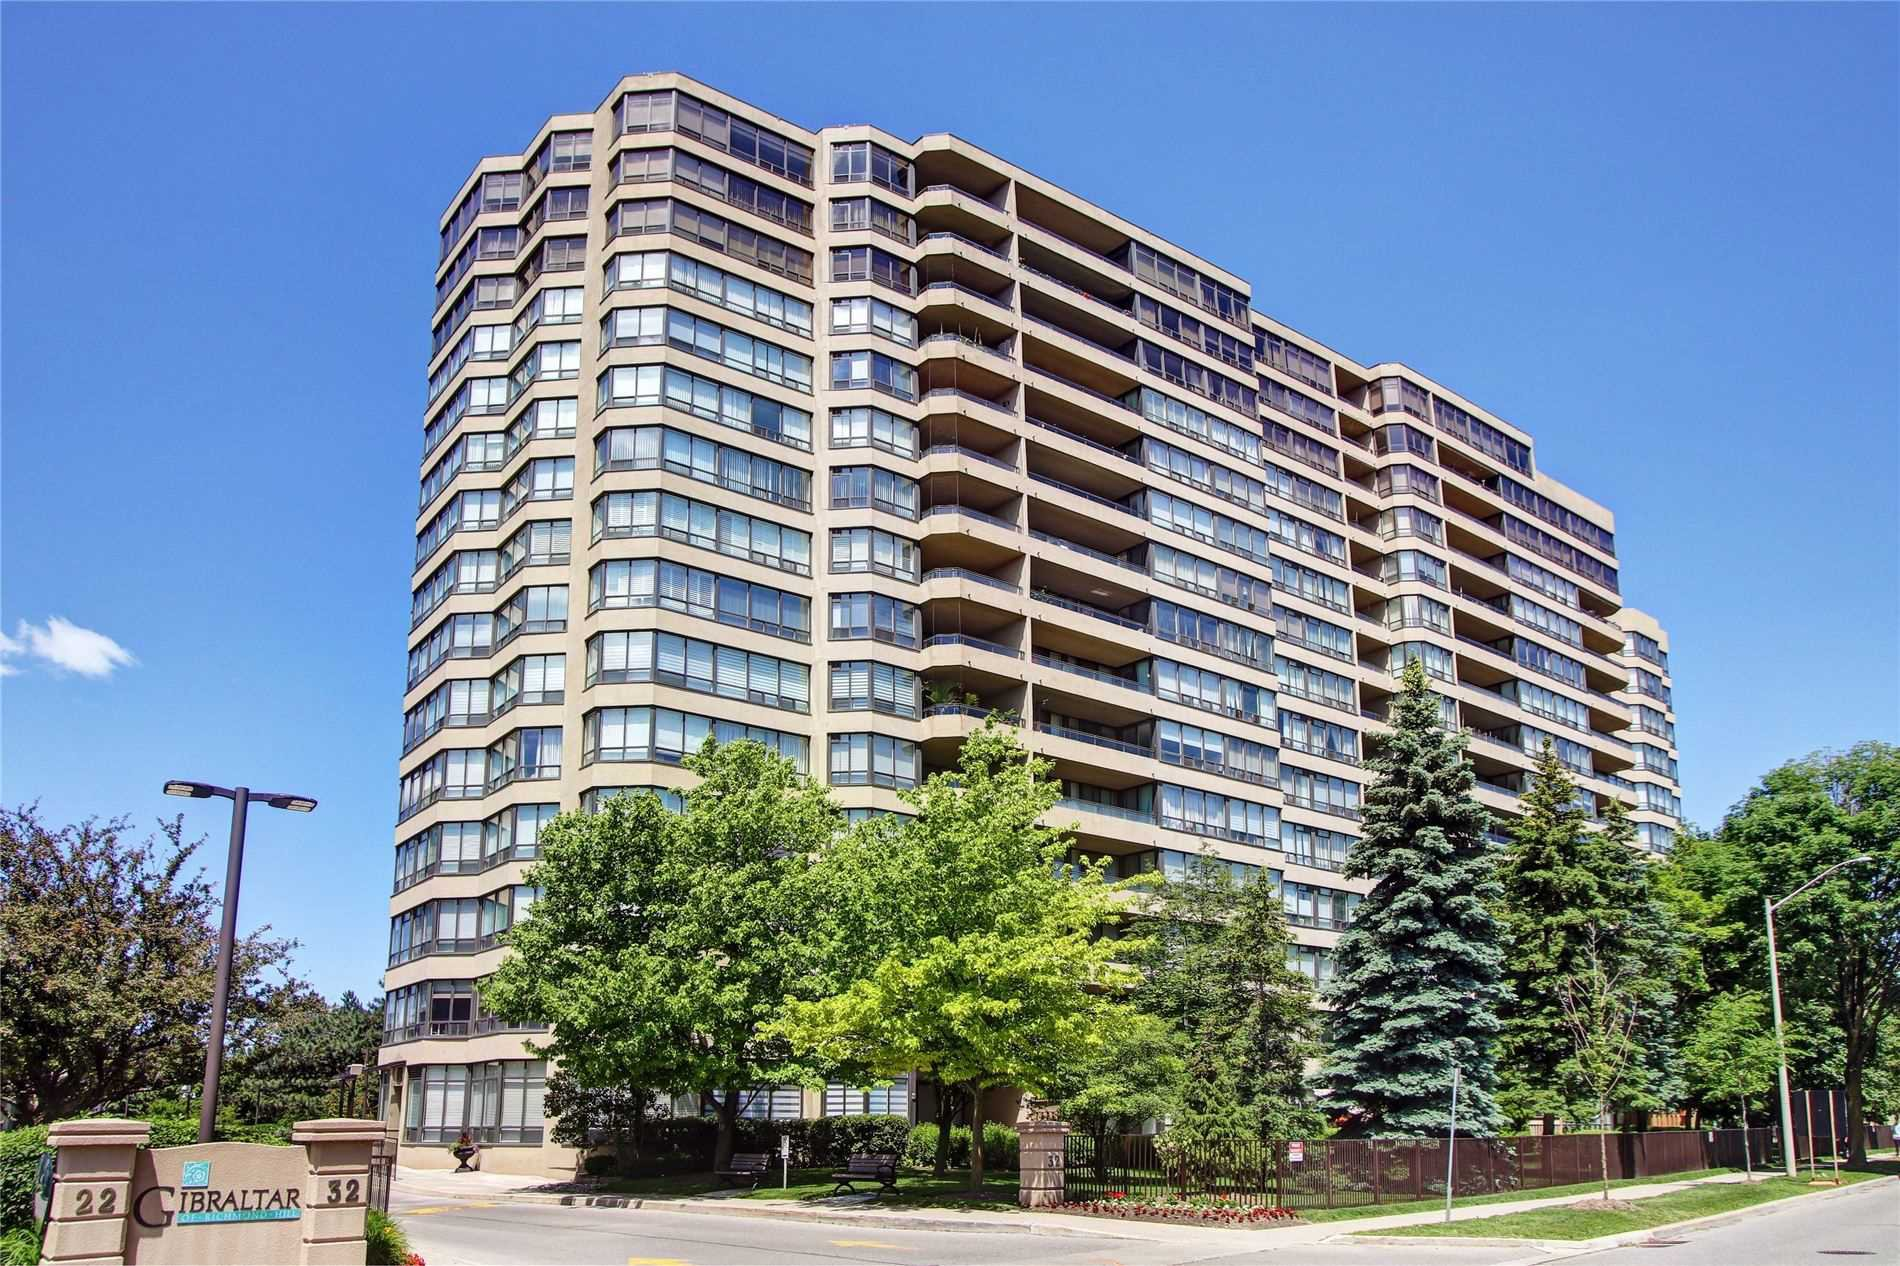 Main Photo: 420 32 Clarissa Drive in Richmond Hill: Harding Condo for sale : MLS®# N4690720